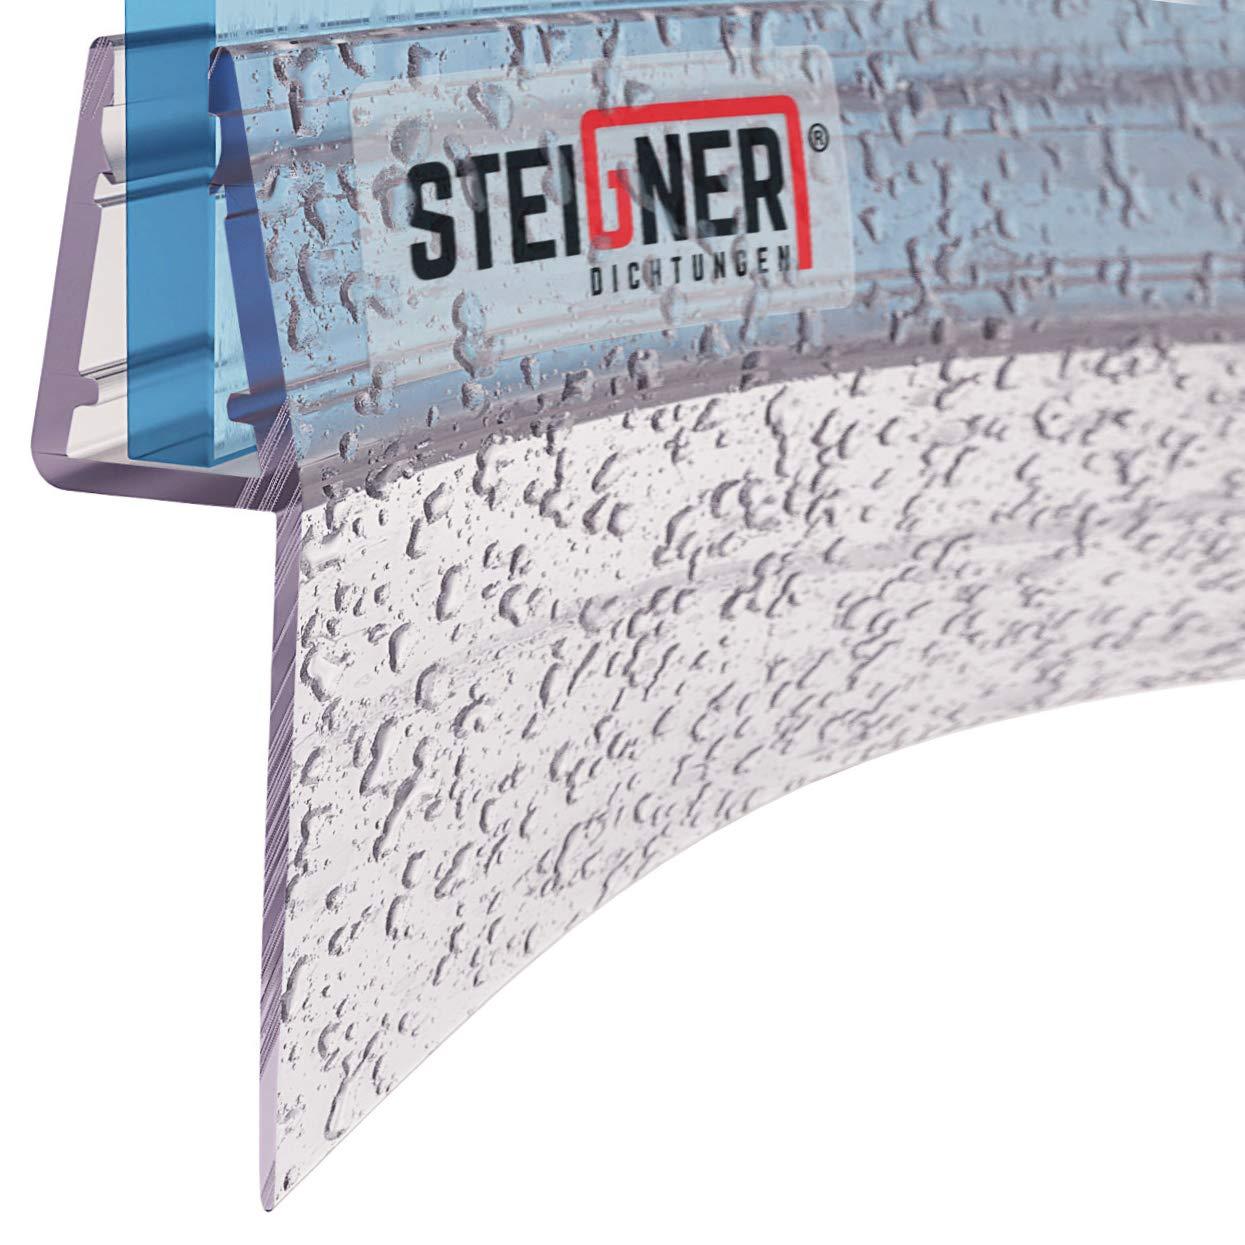 STEIGNER Guarnizione di Ricambio 30 cm UK04 per Vetri di Spessore 3,5 mm 5 mm 4 mm